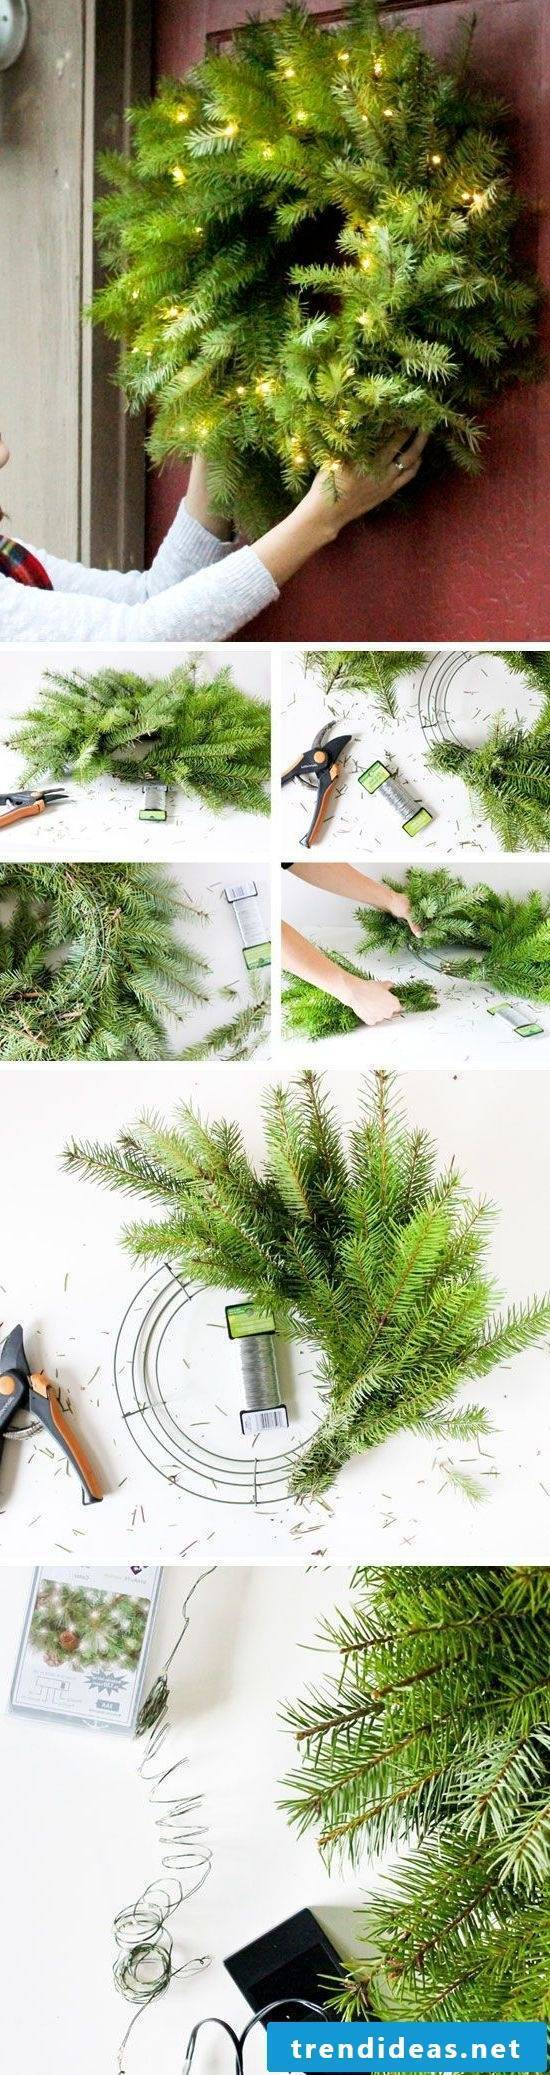 Do Christmas wreath yourself